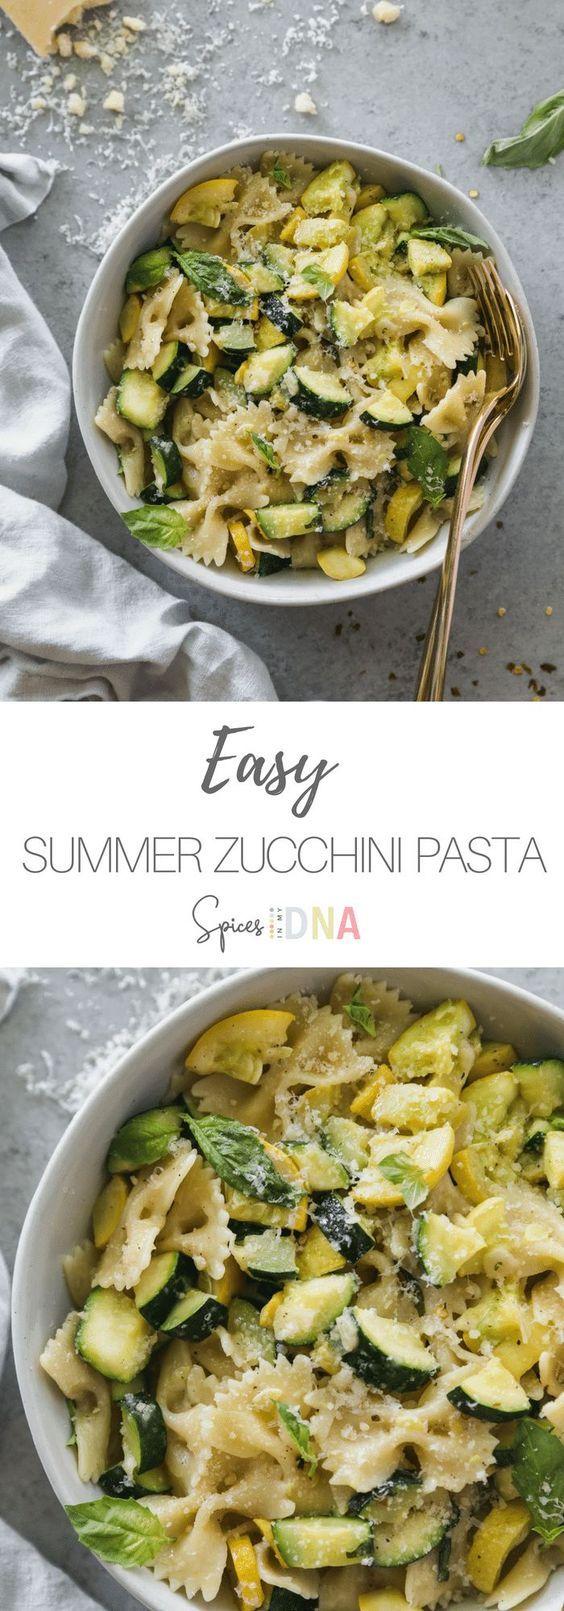 This Easy Summer Zucchini Pasta